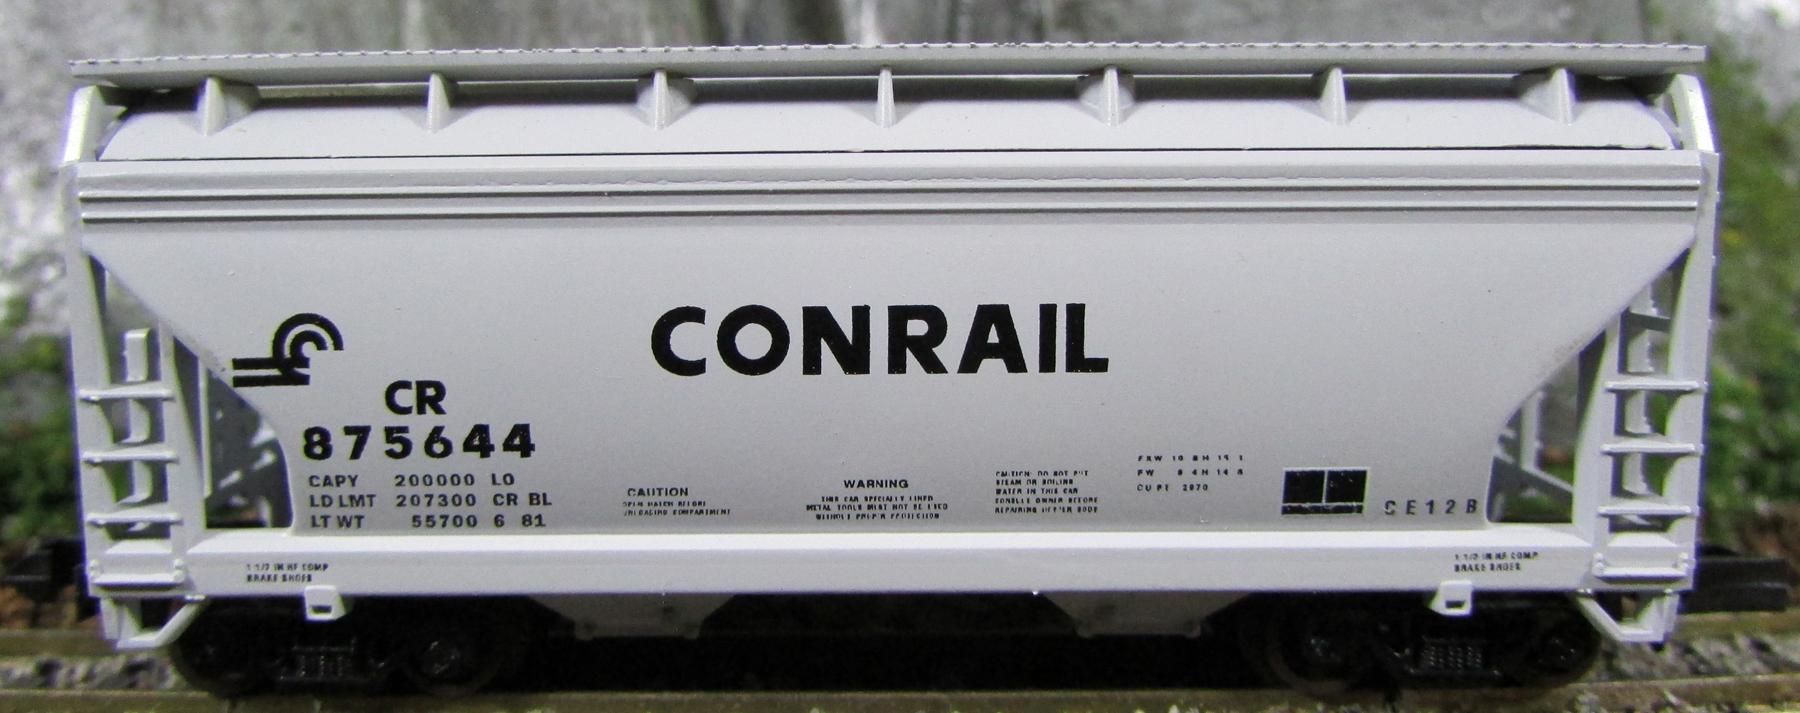 N Scale - Atlas - 3914 - Covered Hopper, 2-Bay, ACF Centerflow - Conrail - 875644